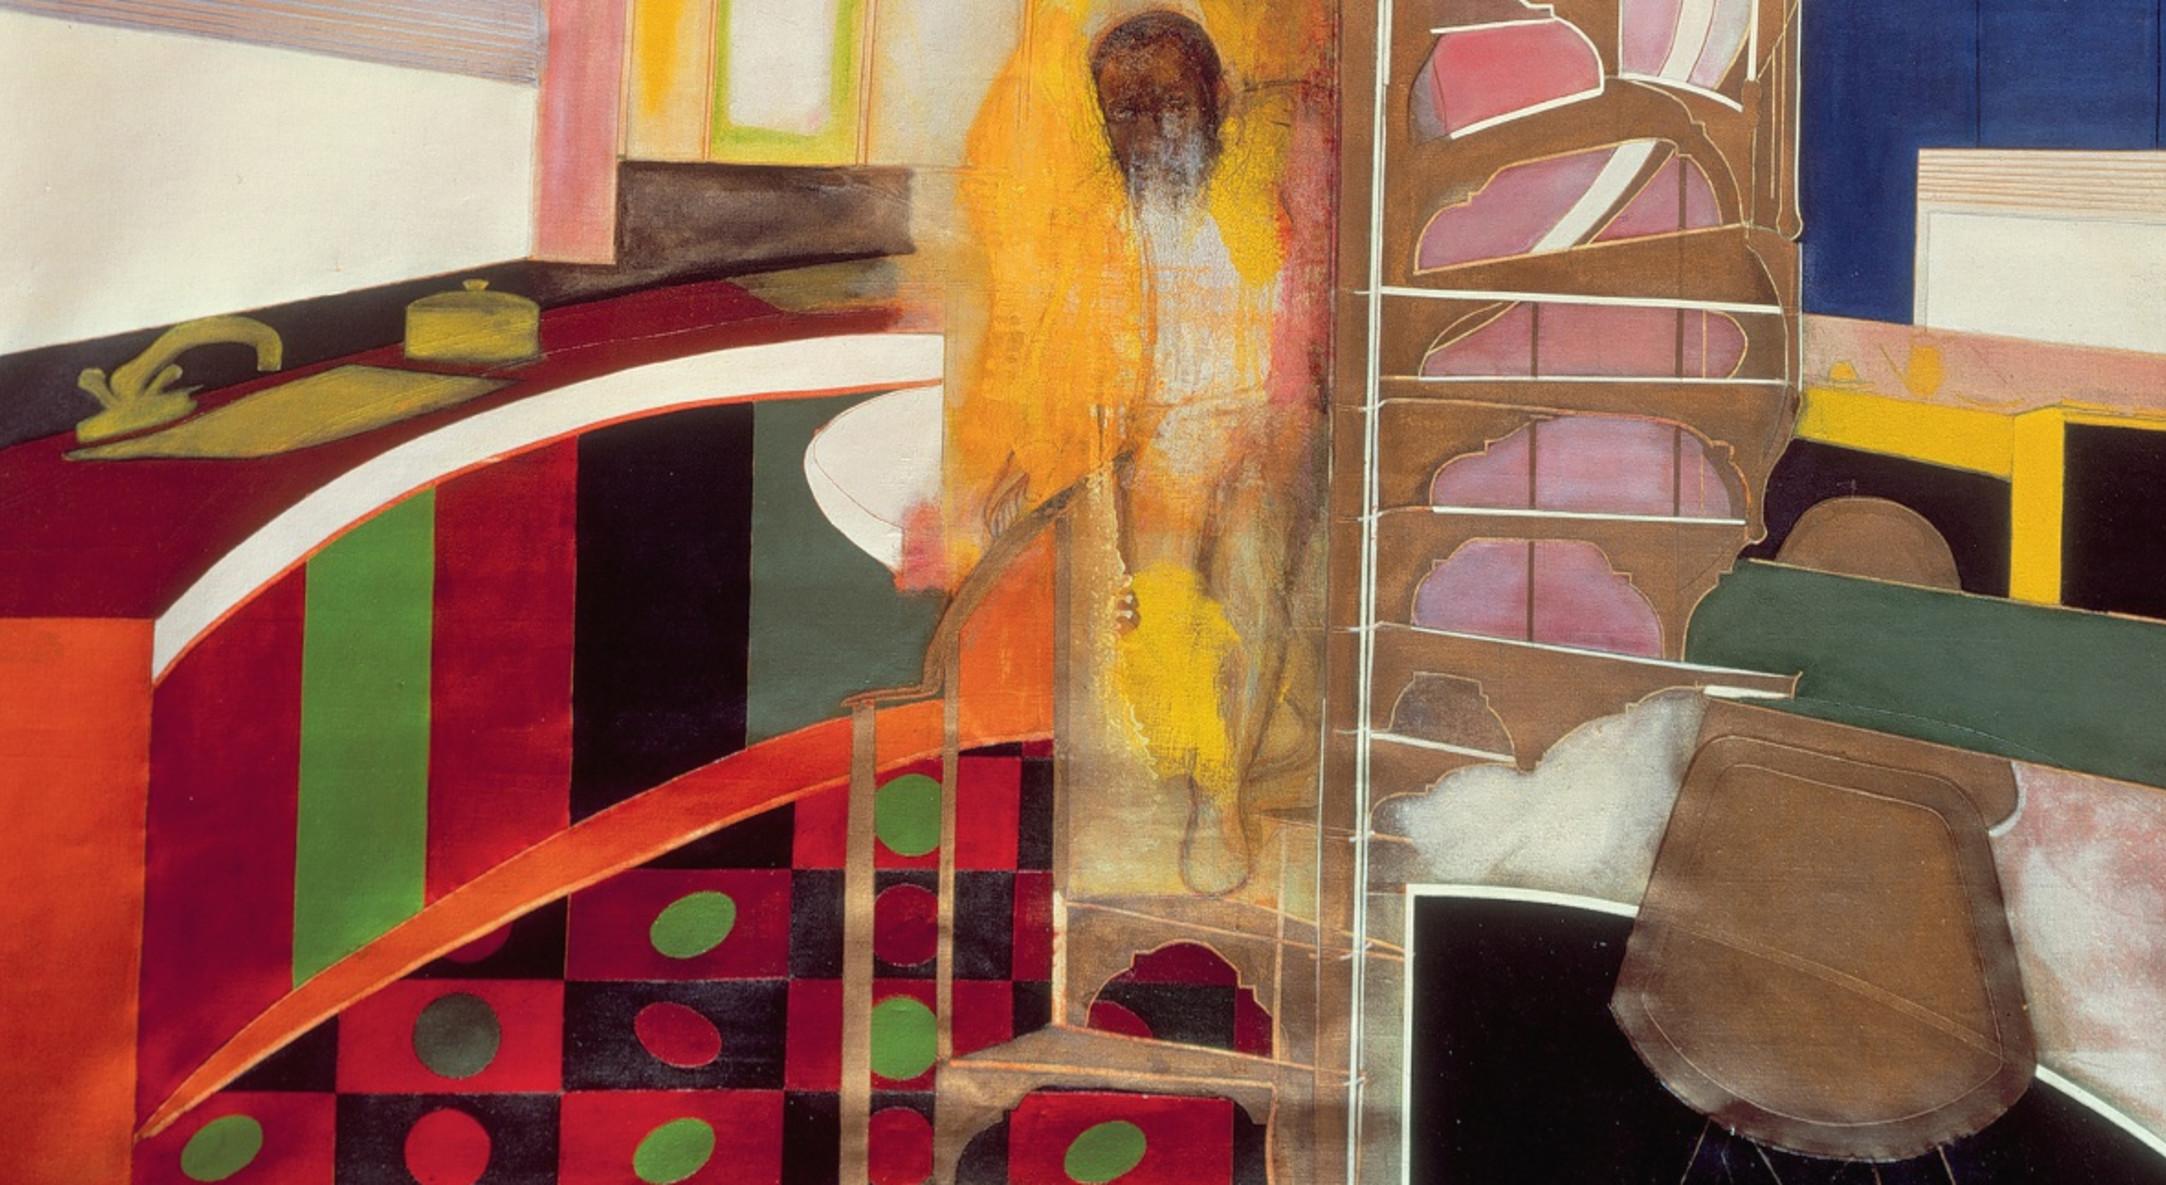 Frank Bowling, 'Mirror' (image detail), 1966. TATE London.